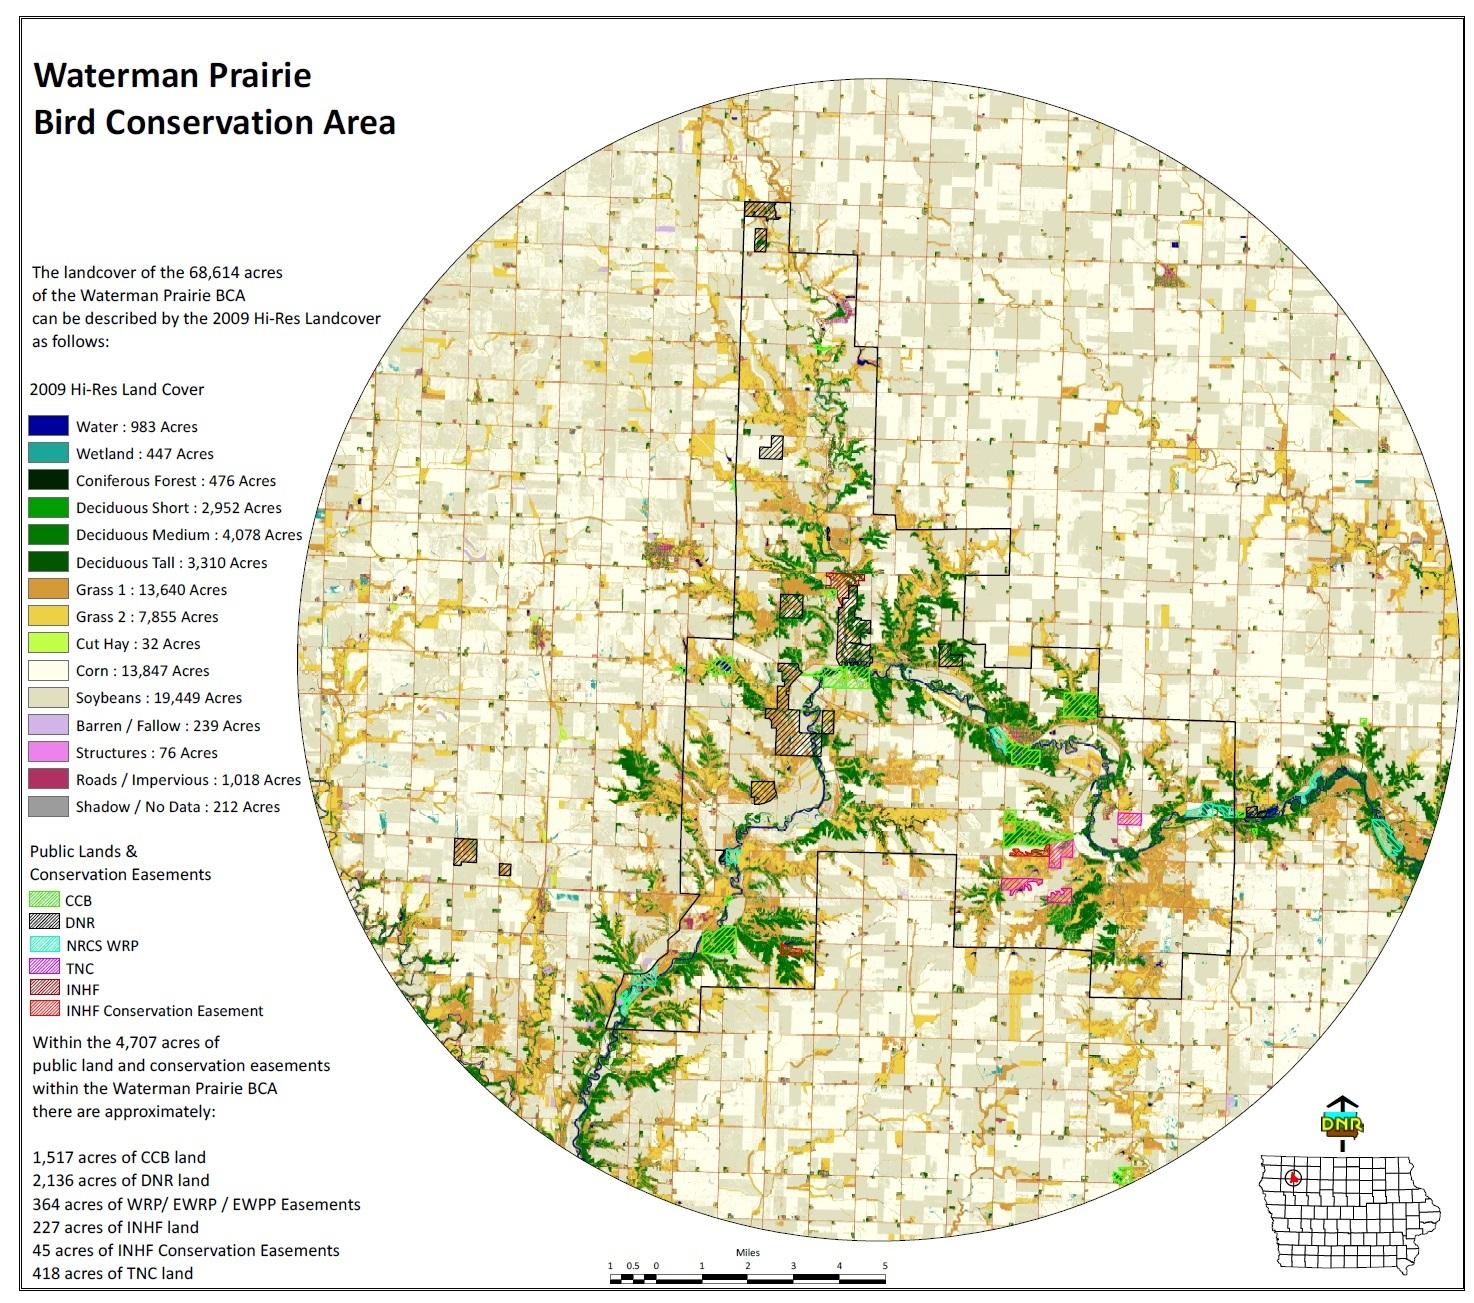 Waterman_Pr__BCA_Map_Final_2-17-15